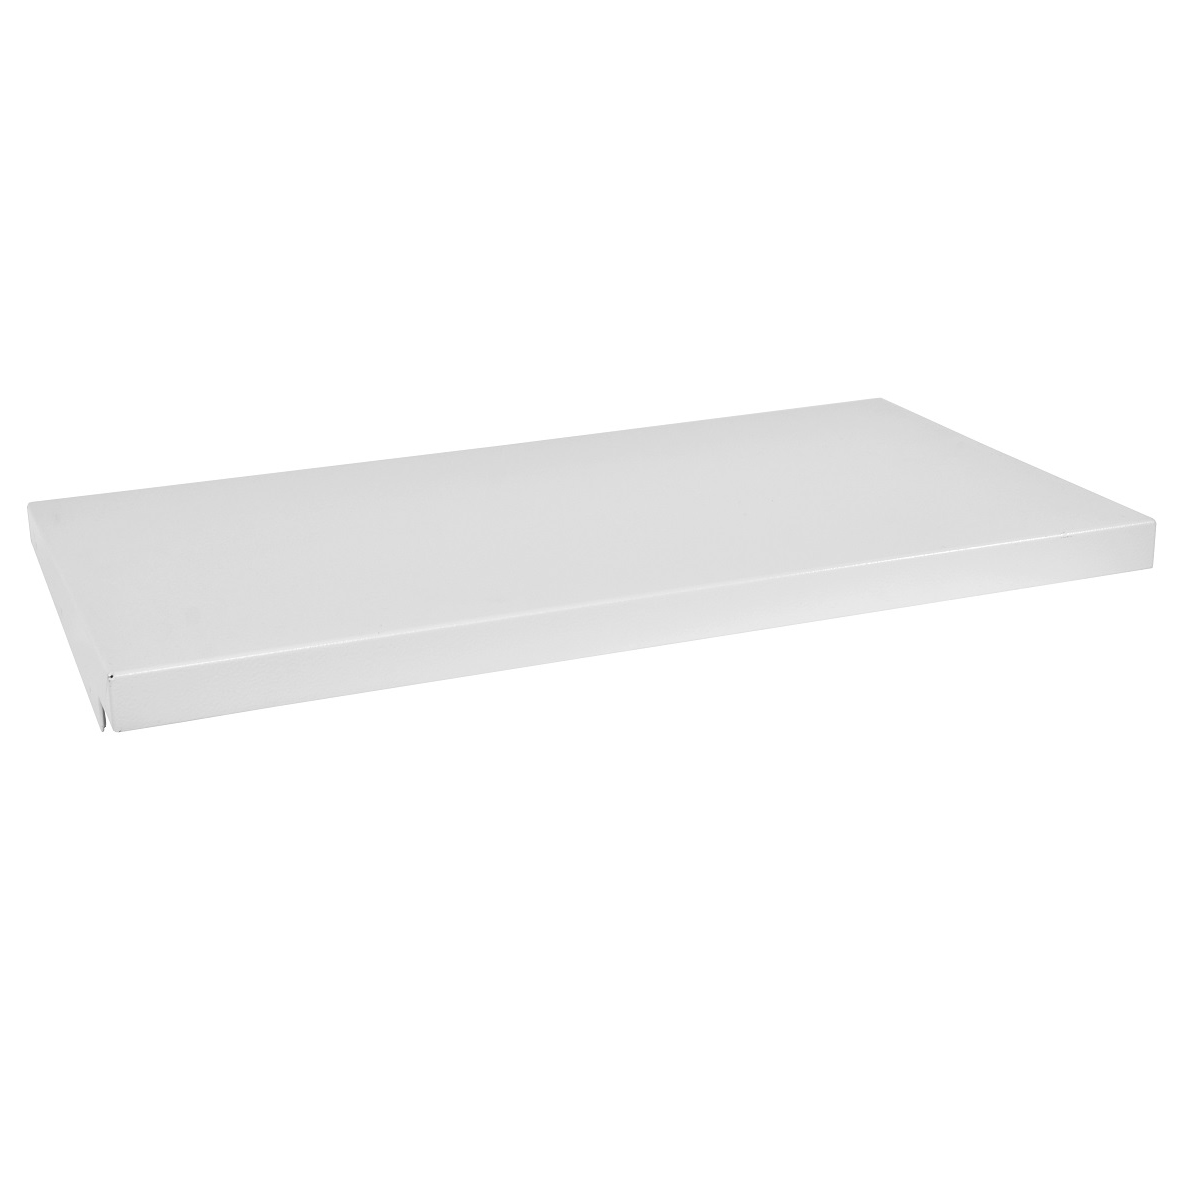 Оцинкованная крыша дождевая для шкафов ЦМО КД-ШТВ-Н-620.300